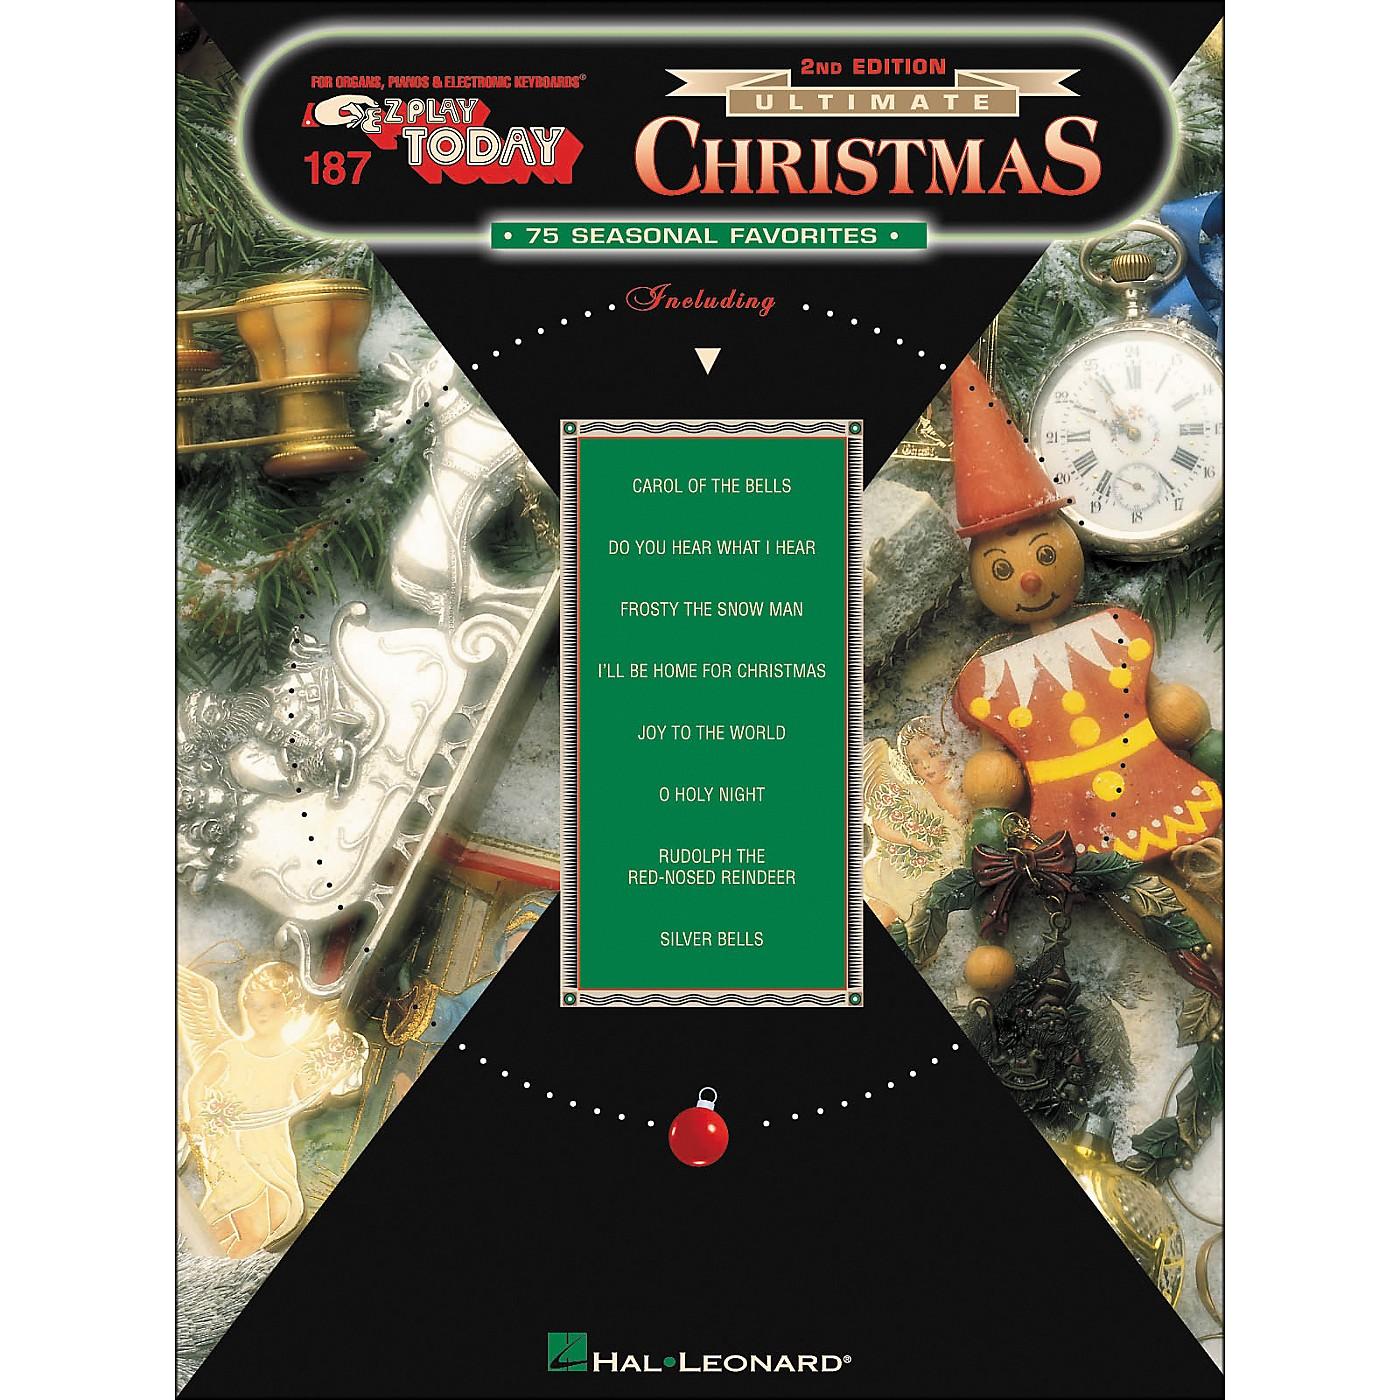 Hal Leonard Ultimate Christmas 75 Seasonal Favorites 2nd Edition E-Z Play 187 thumbnail